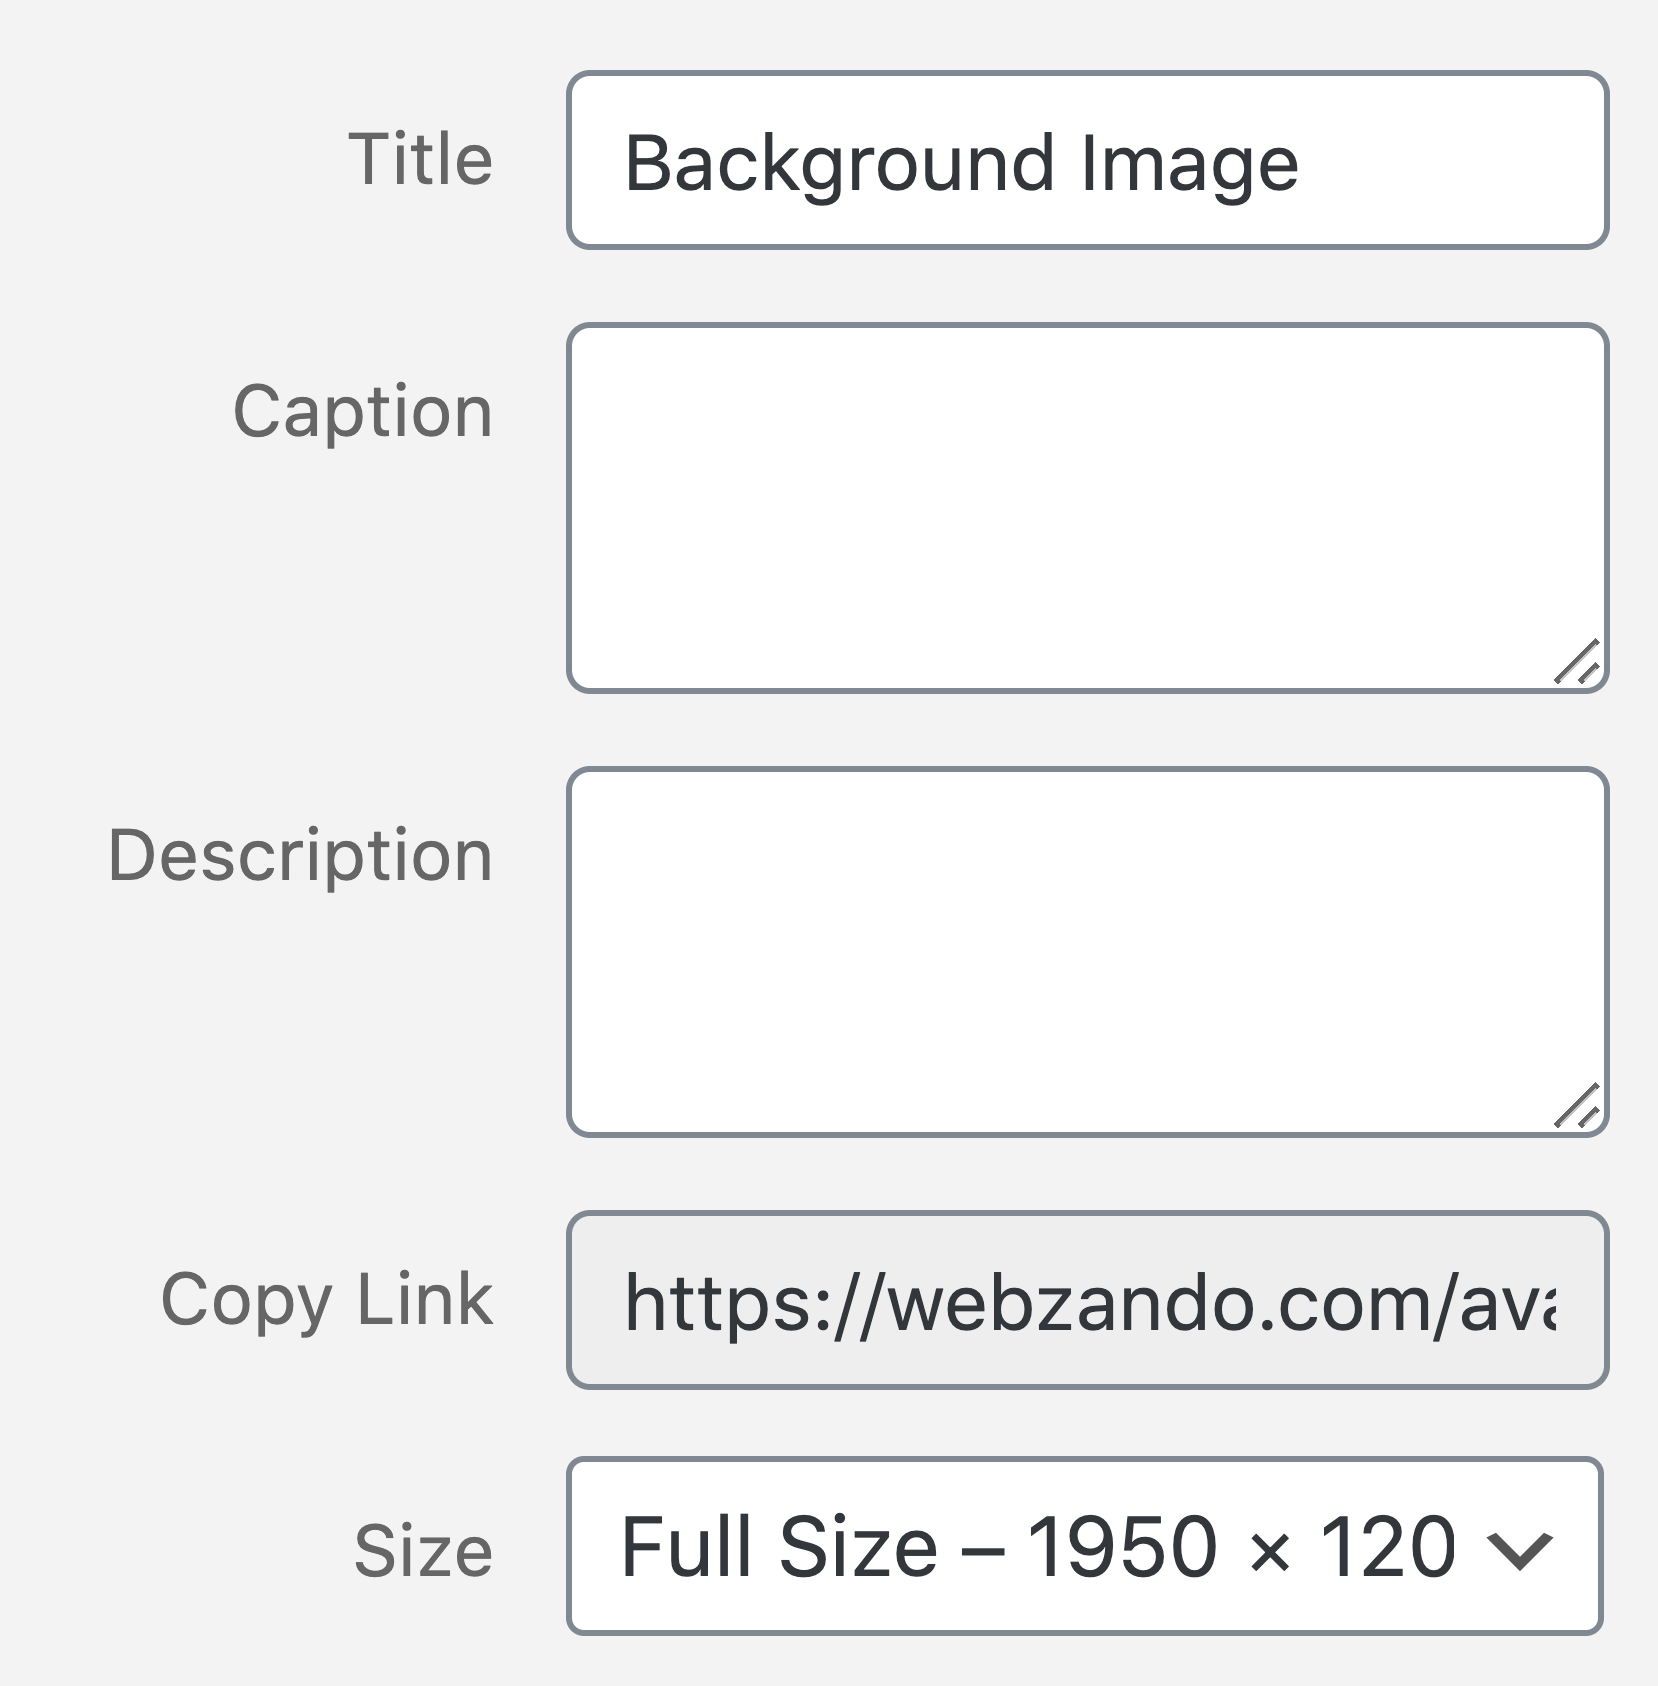 Background Blurred / WP Image Size Selection